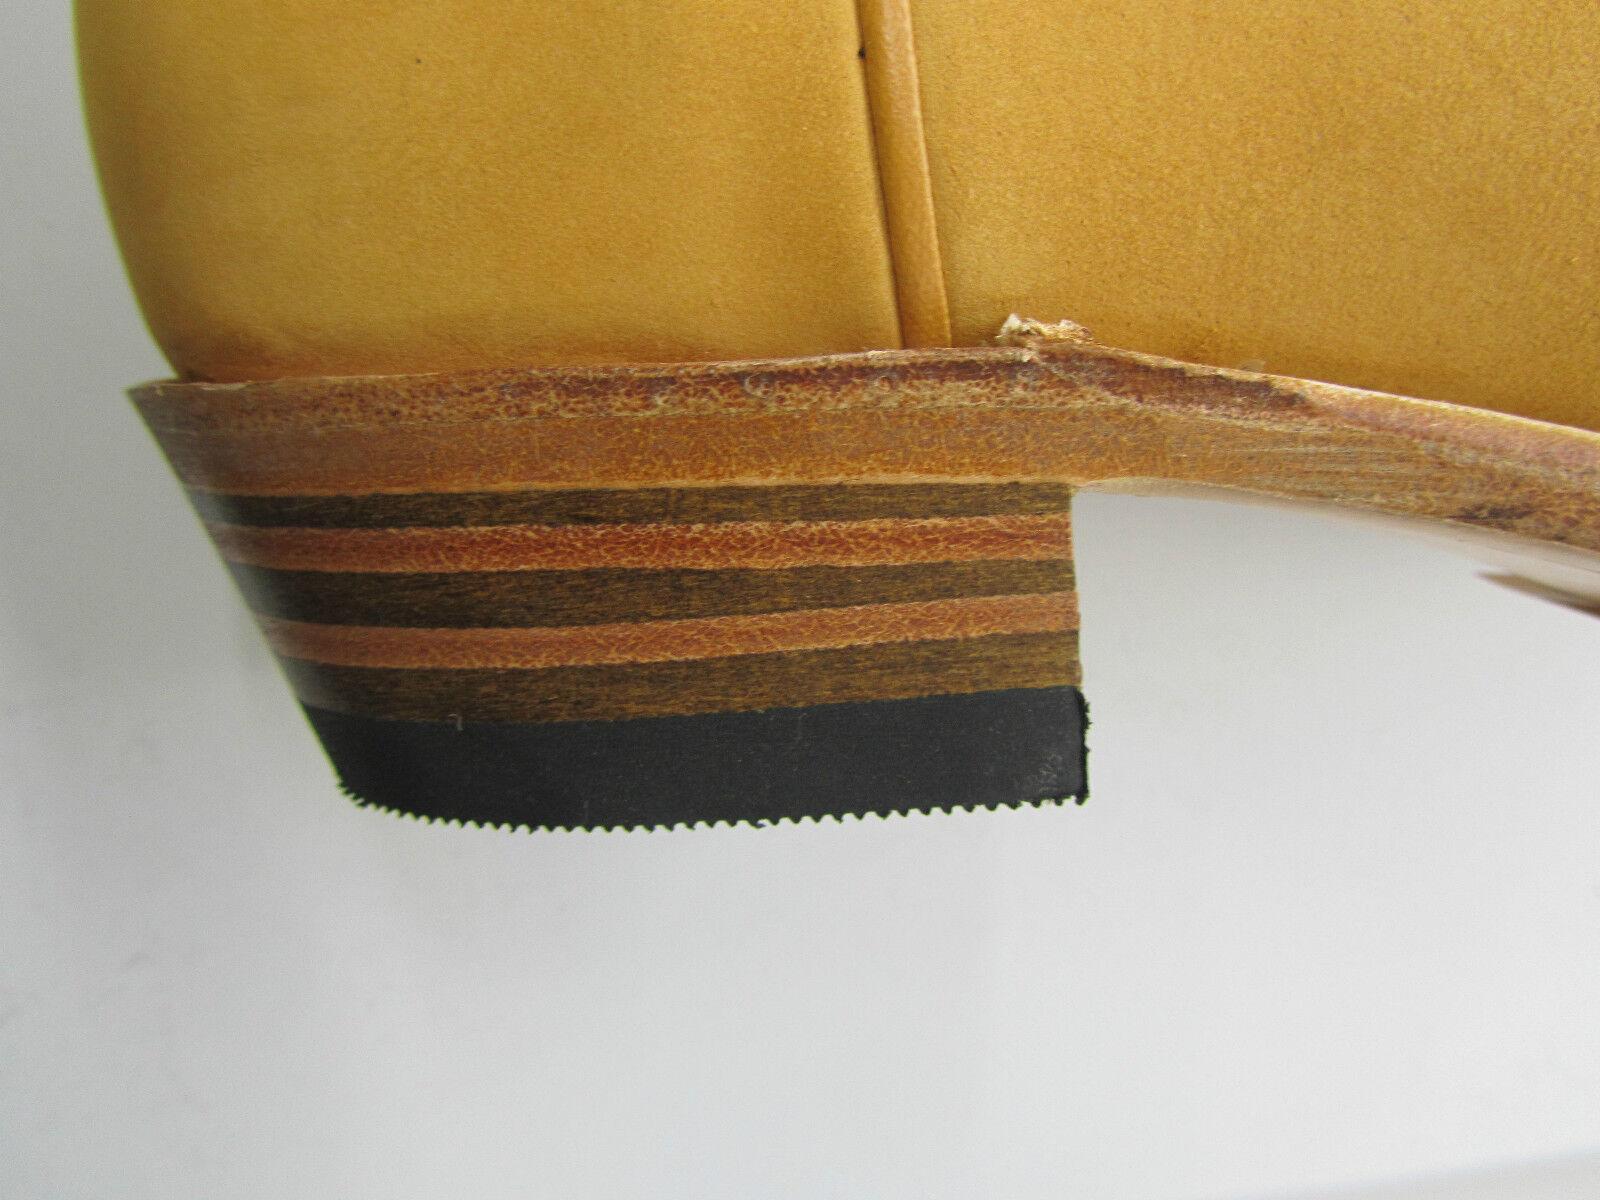 Sendra 2605 Unisex Cowboy Stiefel Tan Handmade Nubuck Leder Western Biker Handmade Tan 0b7135